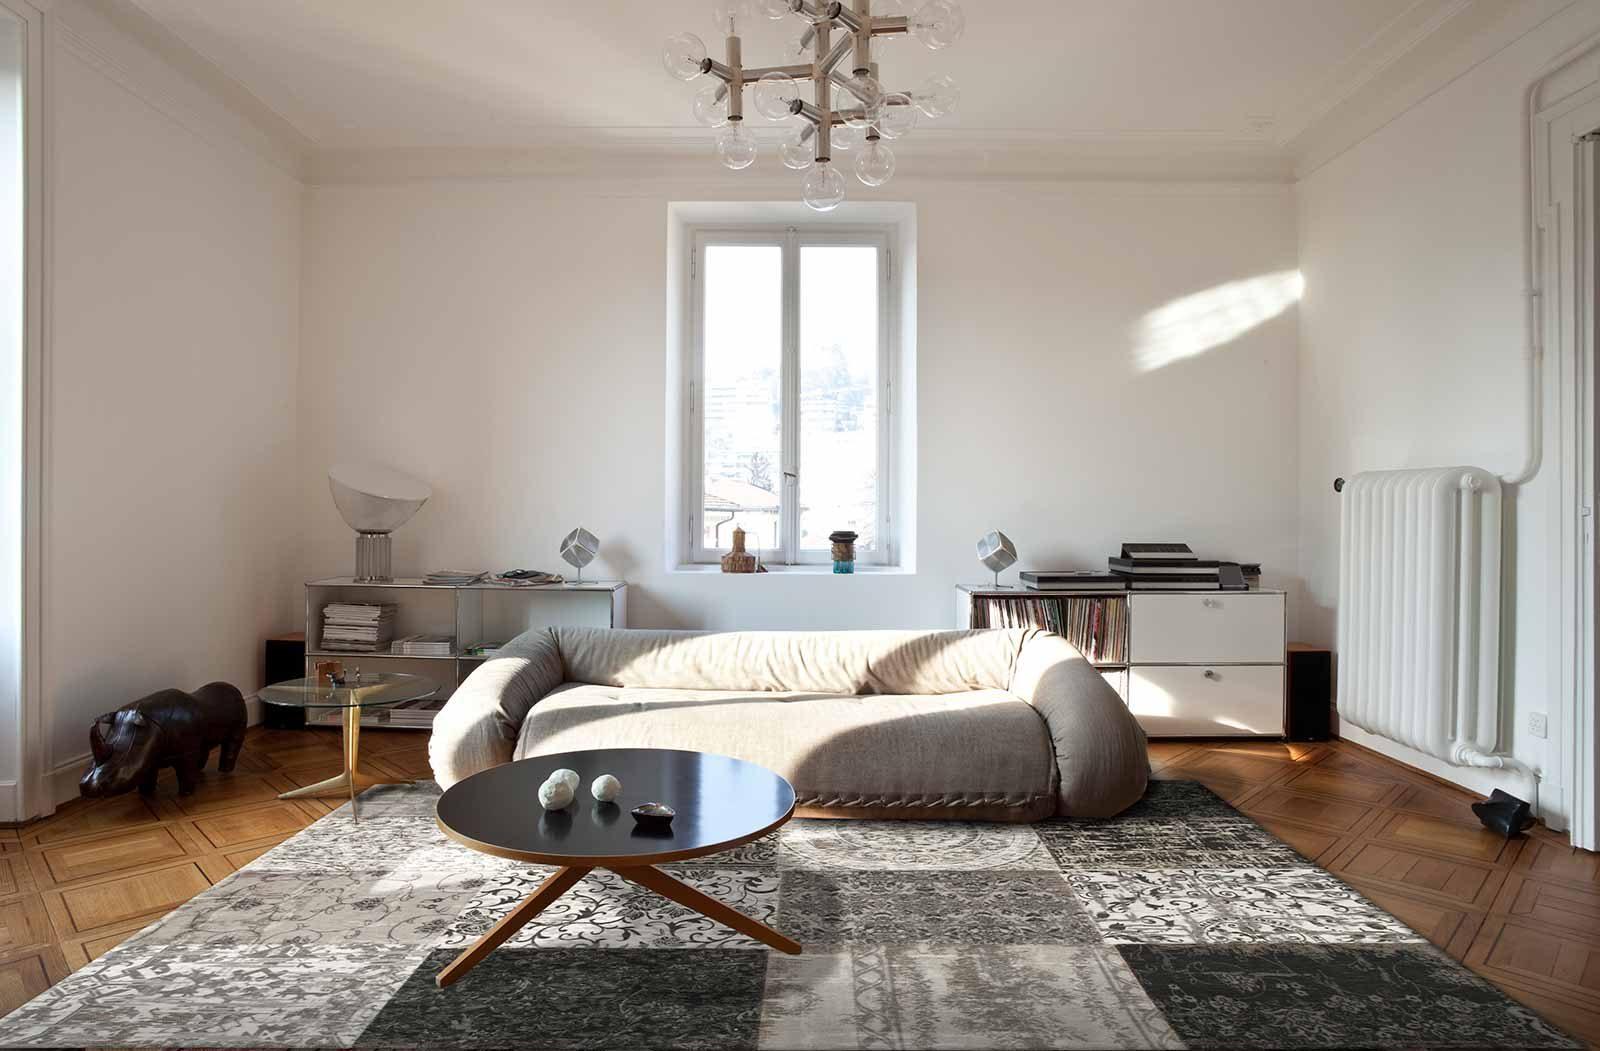 tapijt Louis De Poortere LX8101 Vintage Black White interior